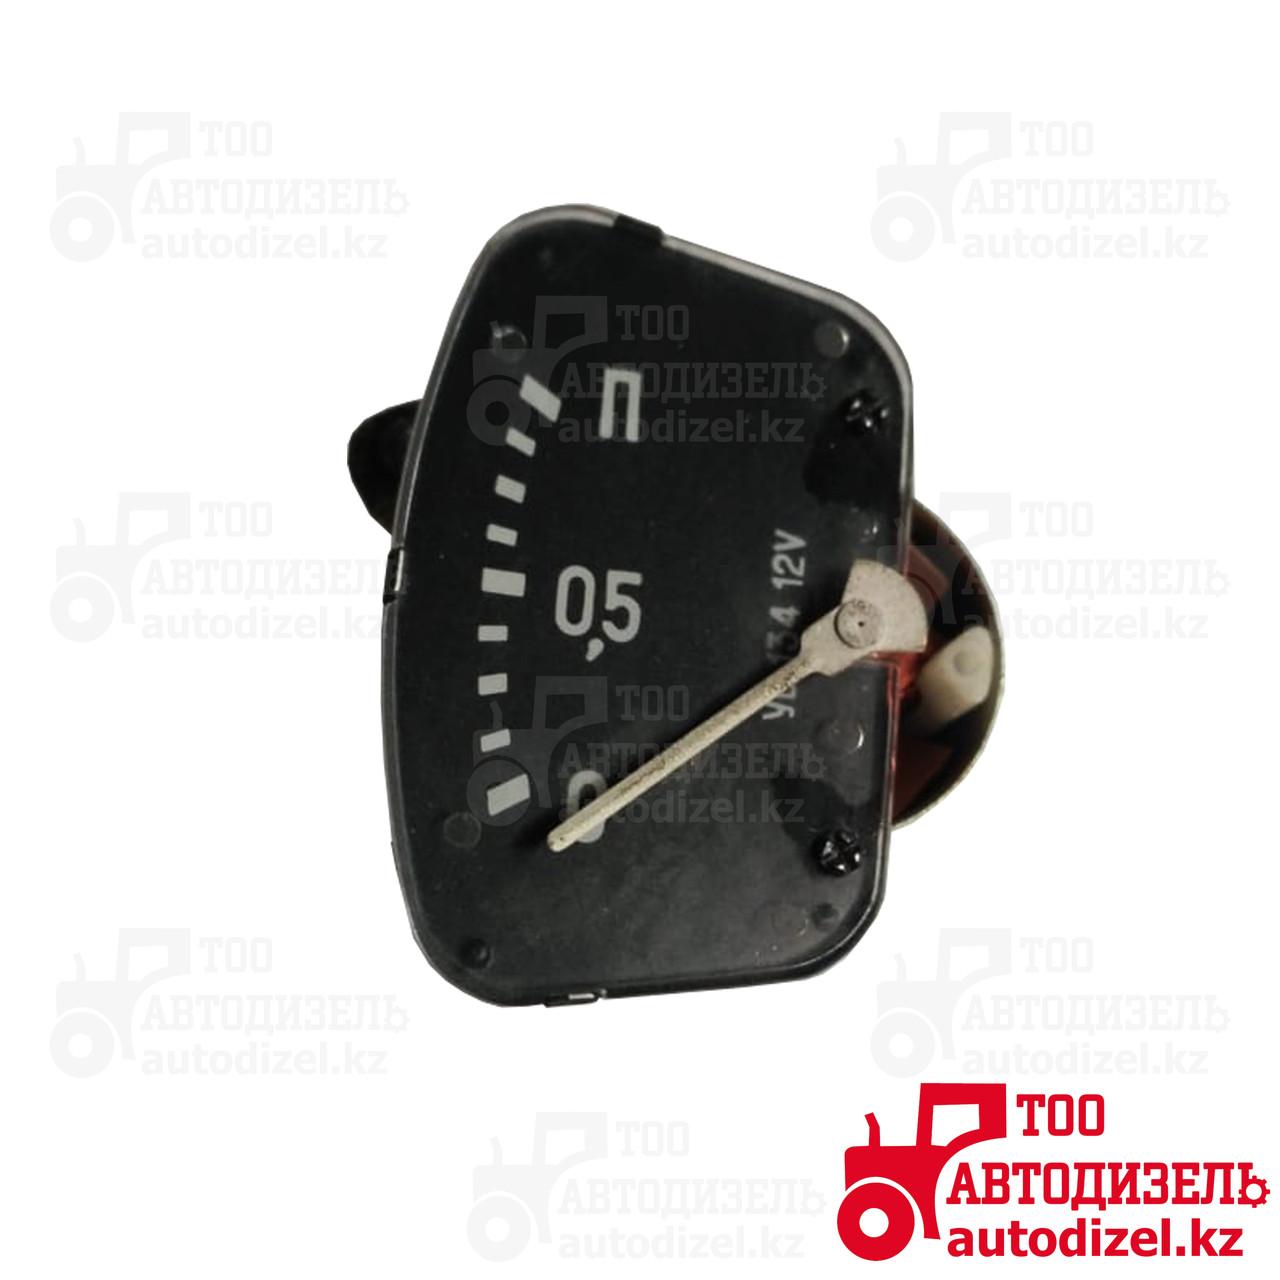 Указатель уровня топлива ЛИАЗ, ПАЗ - УБ 134